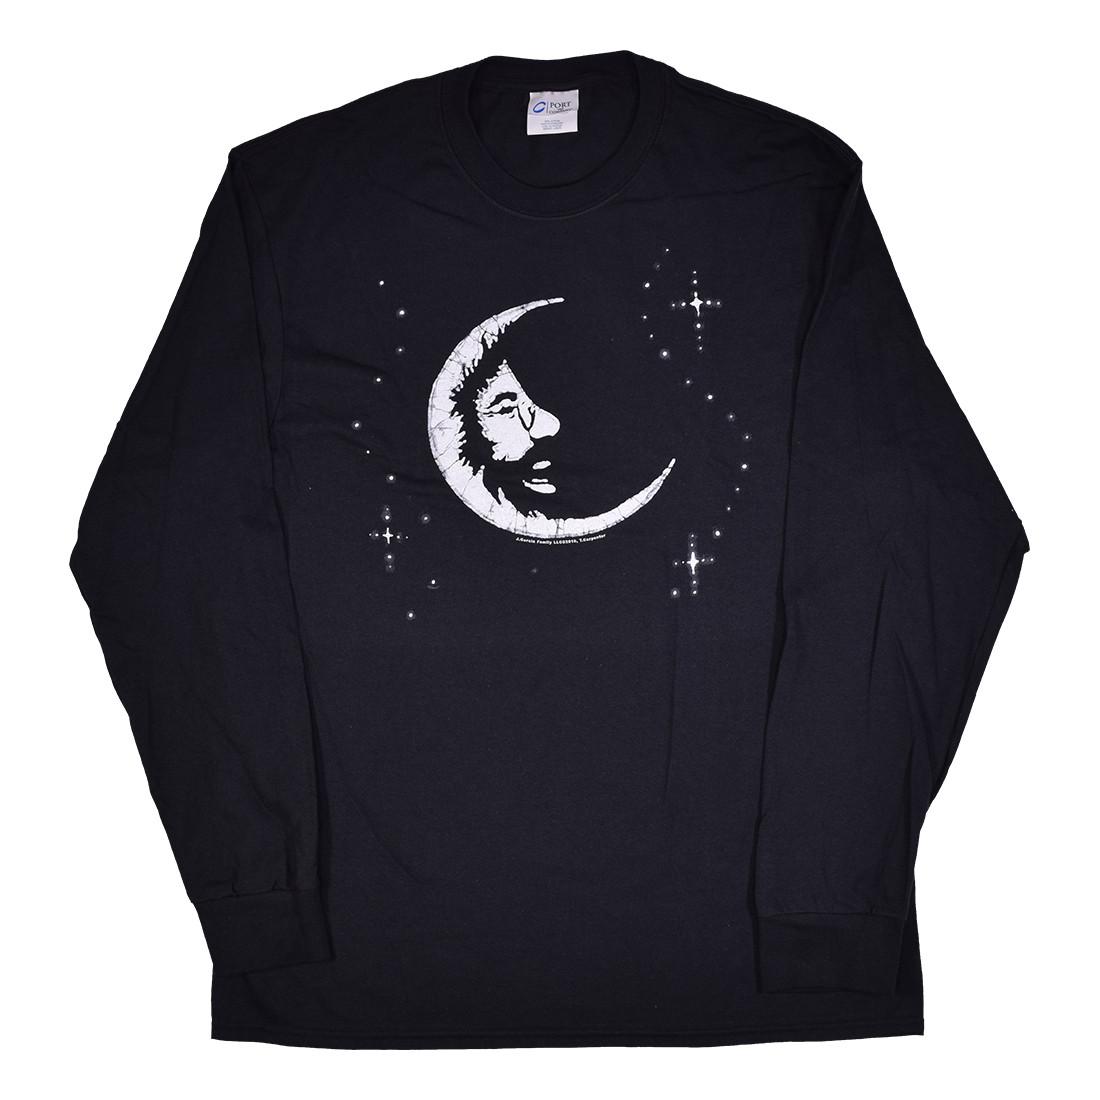 Jerry Moon Black Long Sleeve T-Shirt